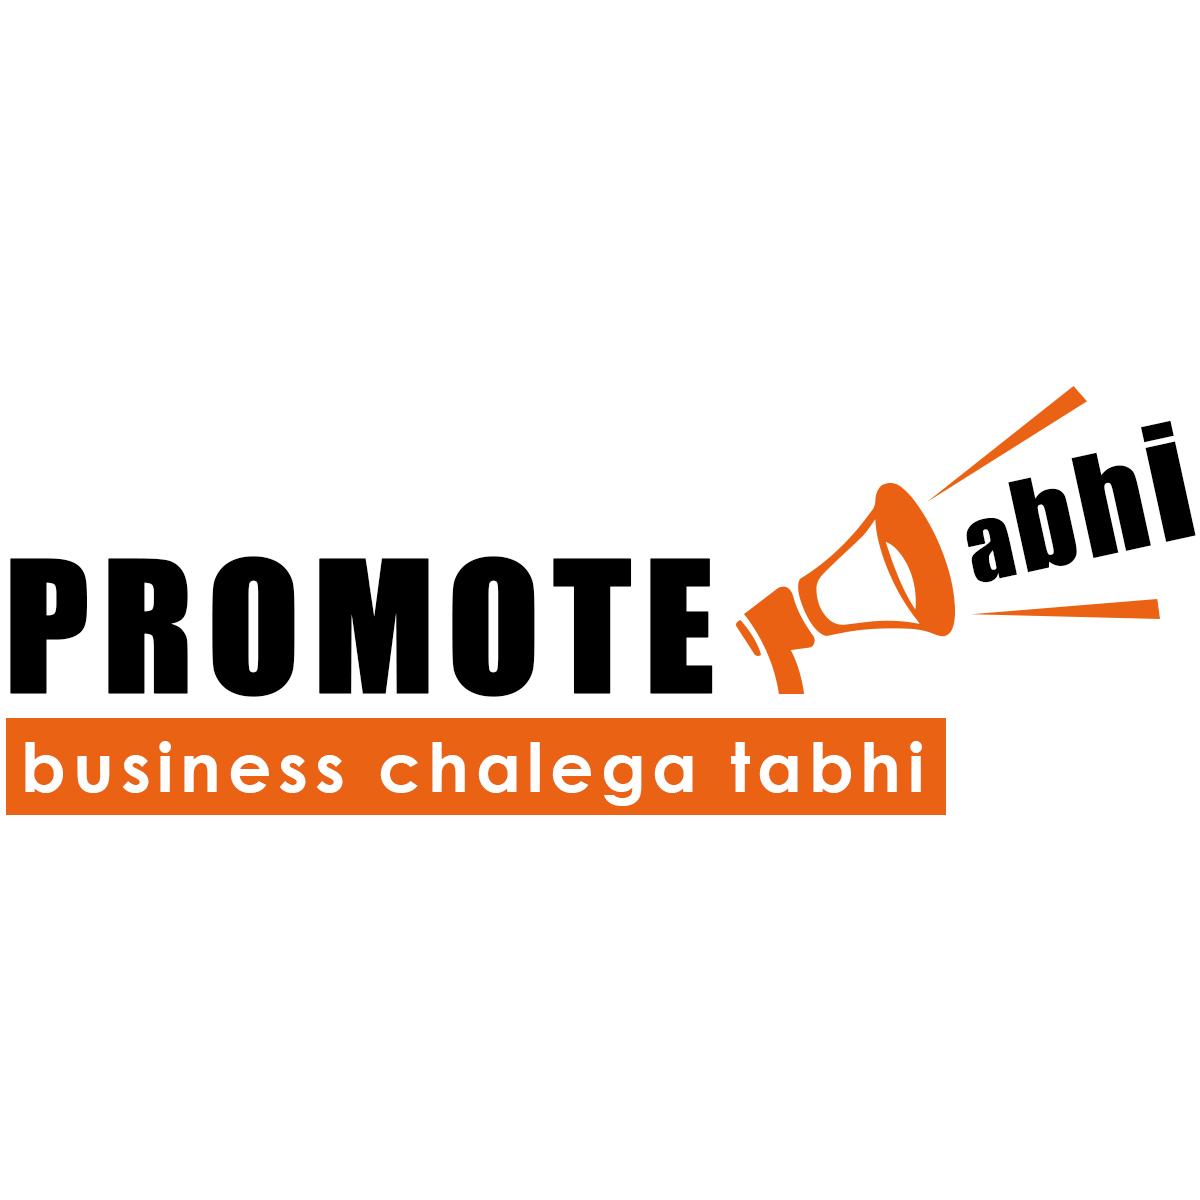 Promote ABHI